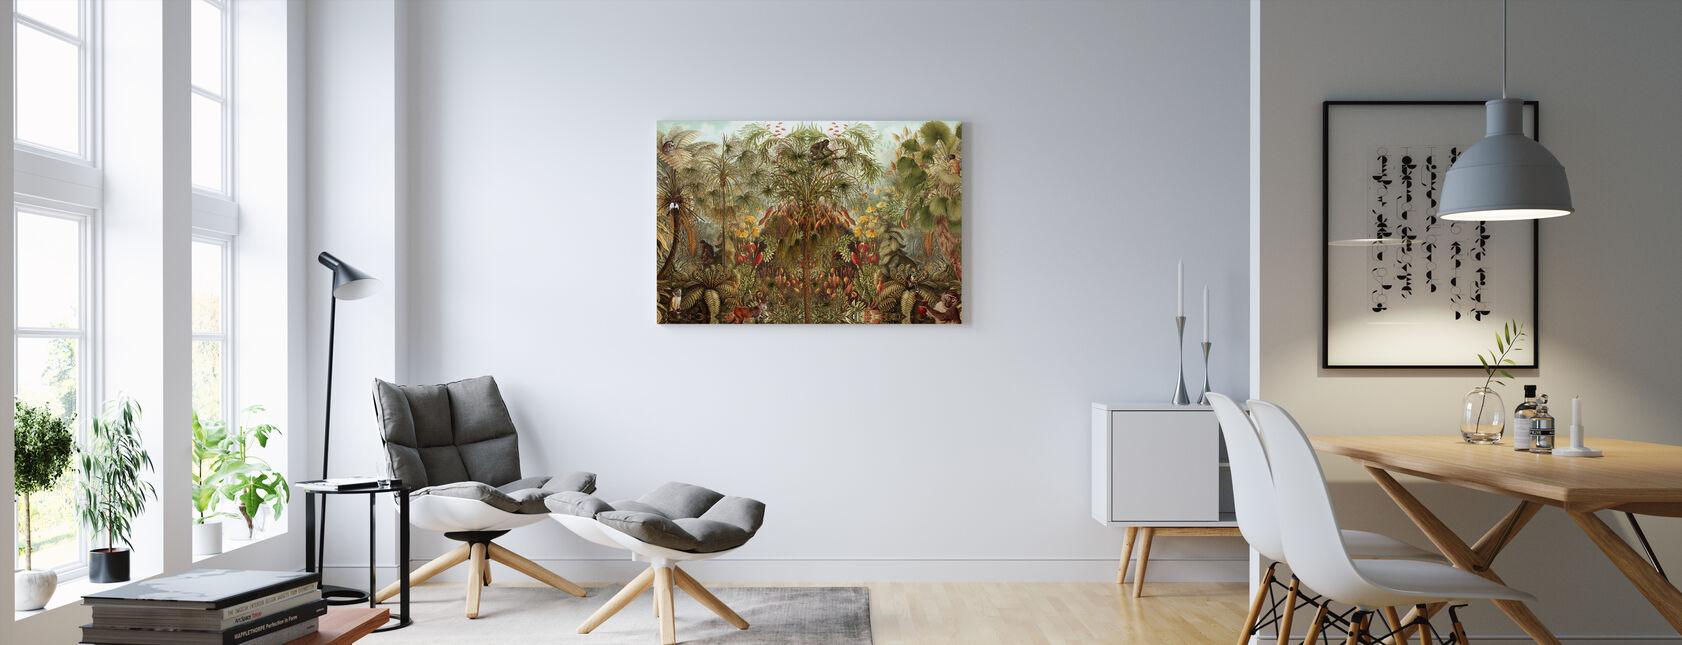 Monkey See Monkey Wah - Canvas print - Living Room